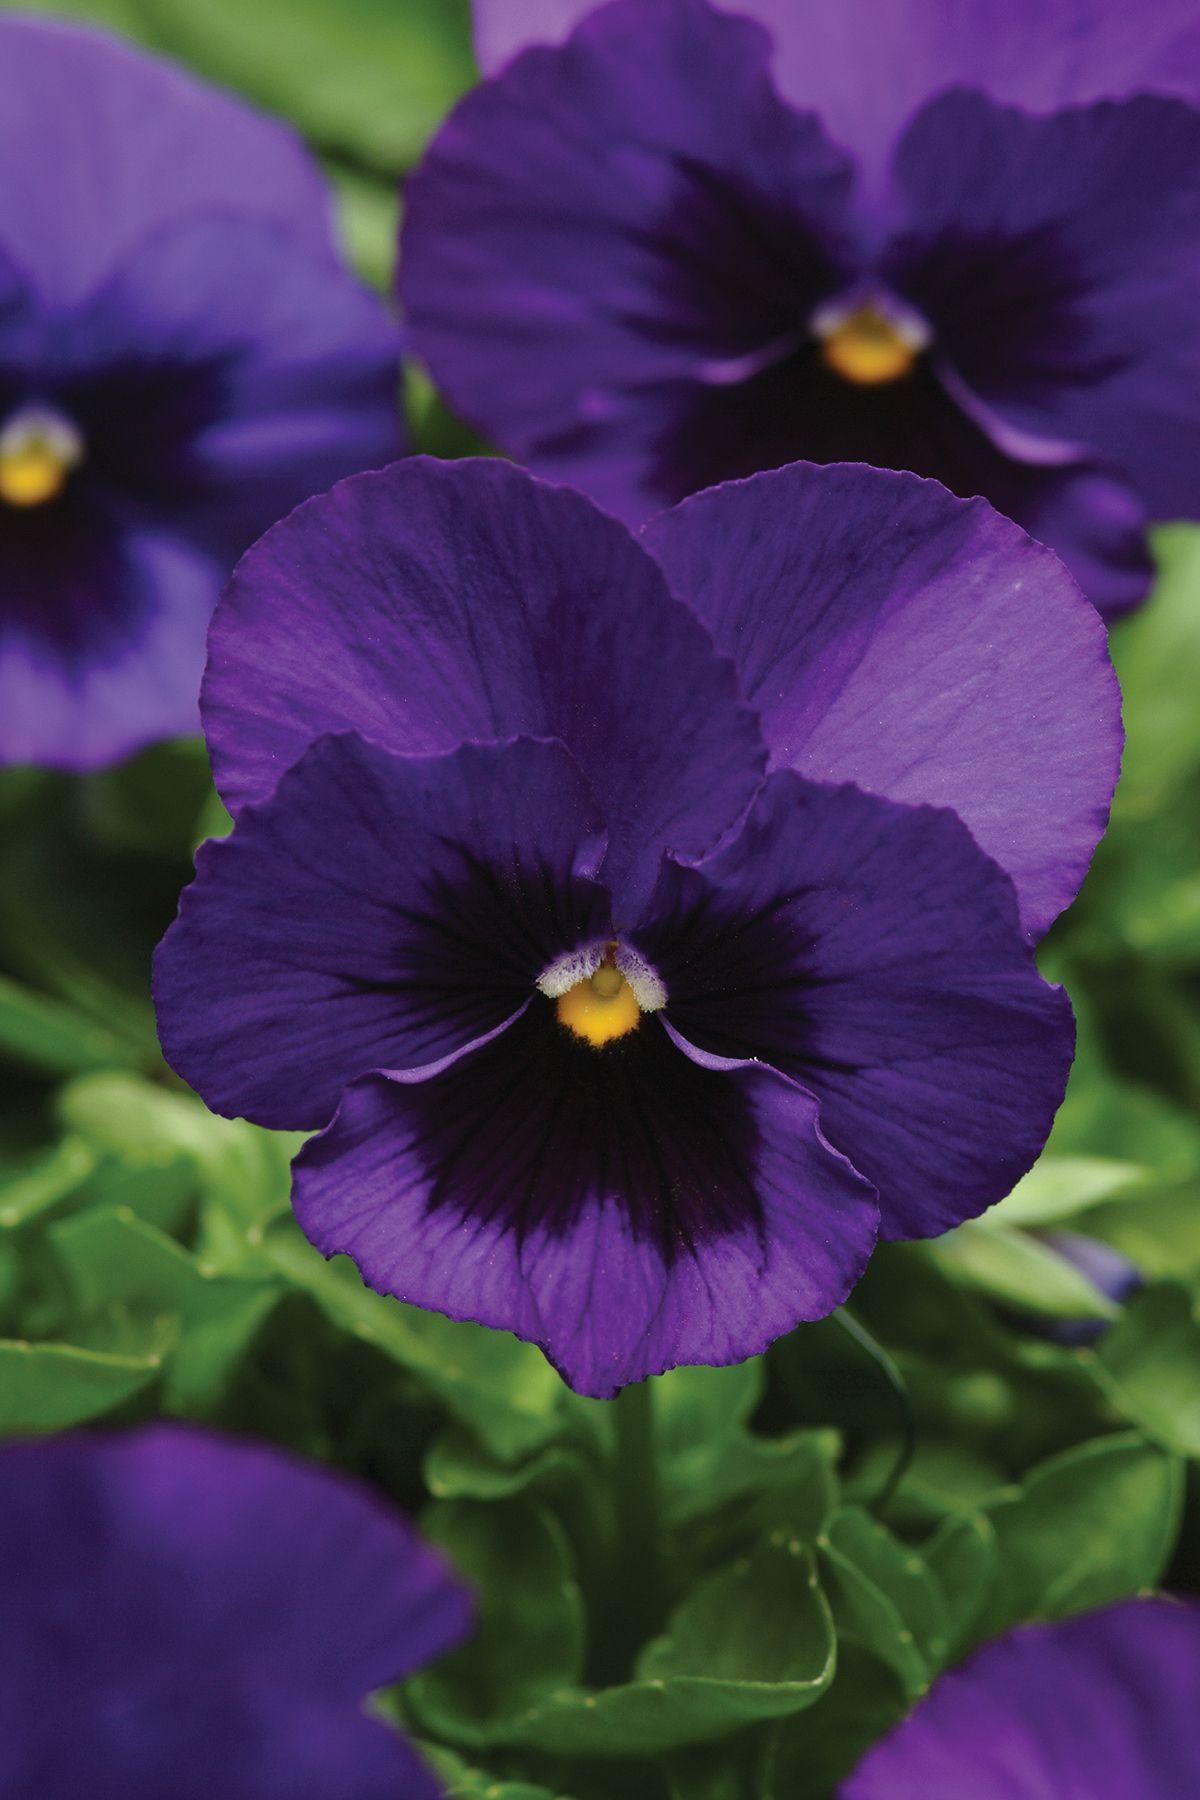 Deep Purple Pansy Pansies Flowers Beautiful Flowers Purple Pansy